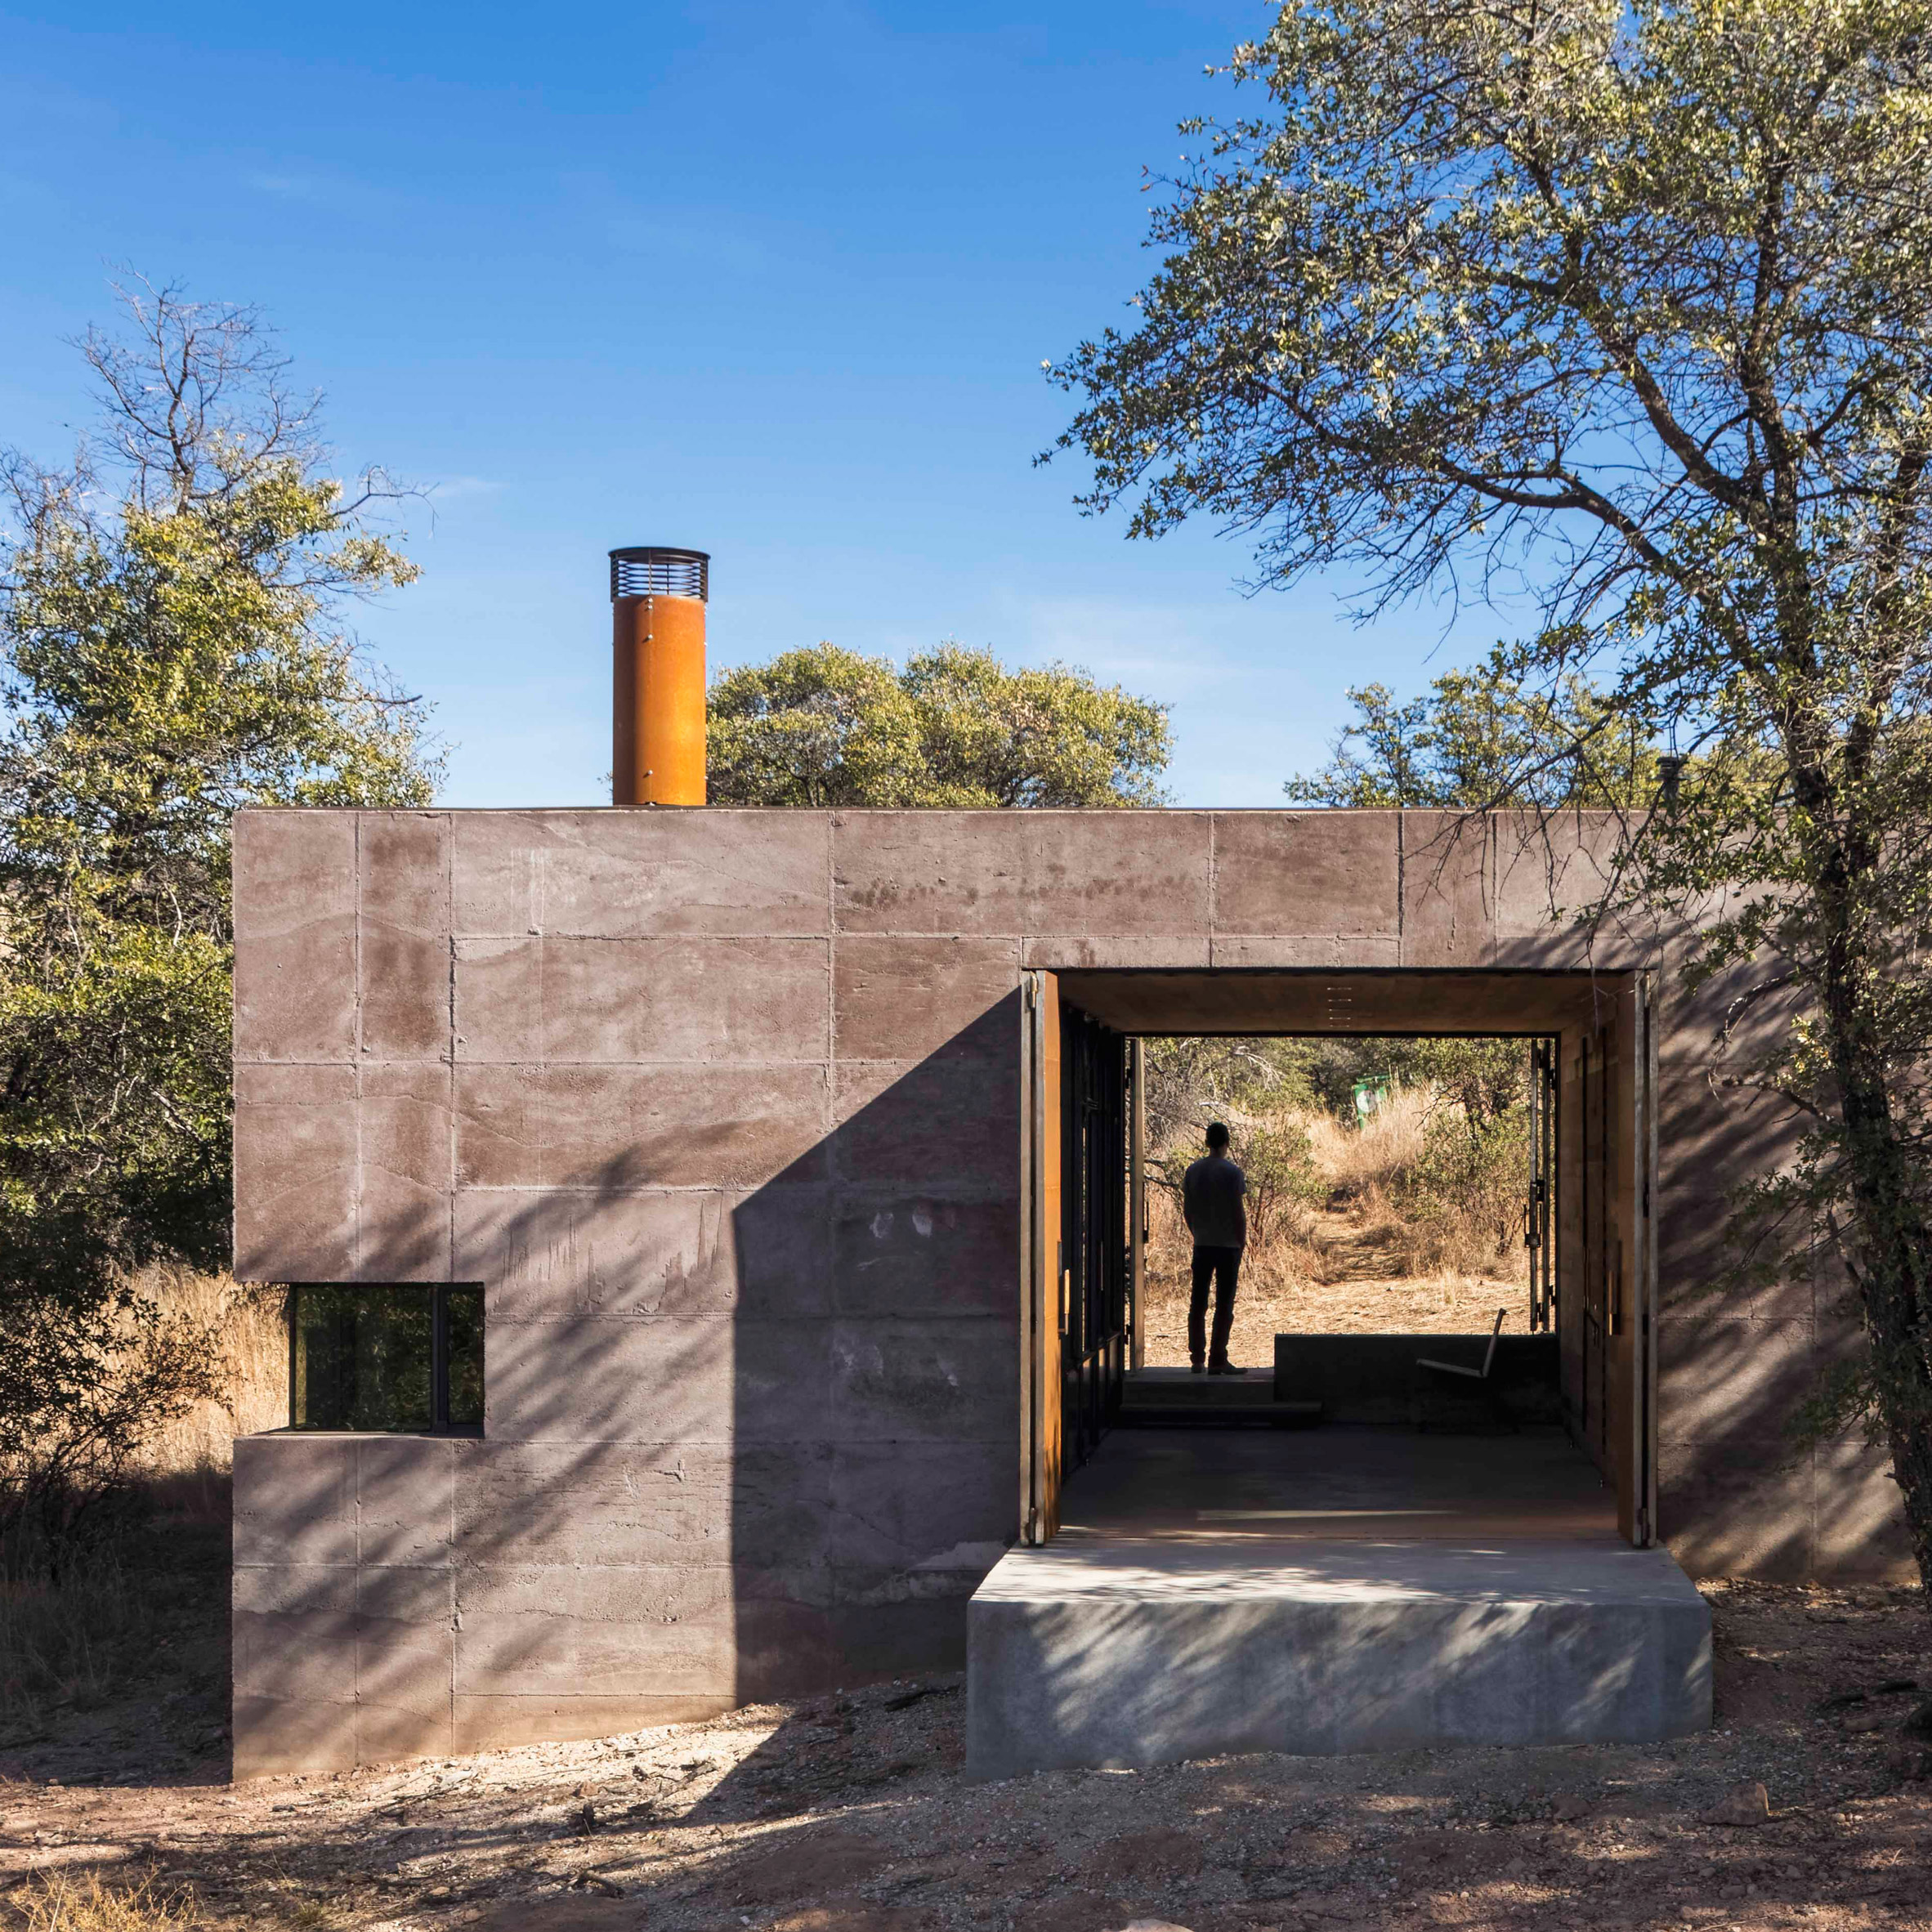 Casa Caldera by DUST